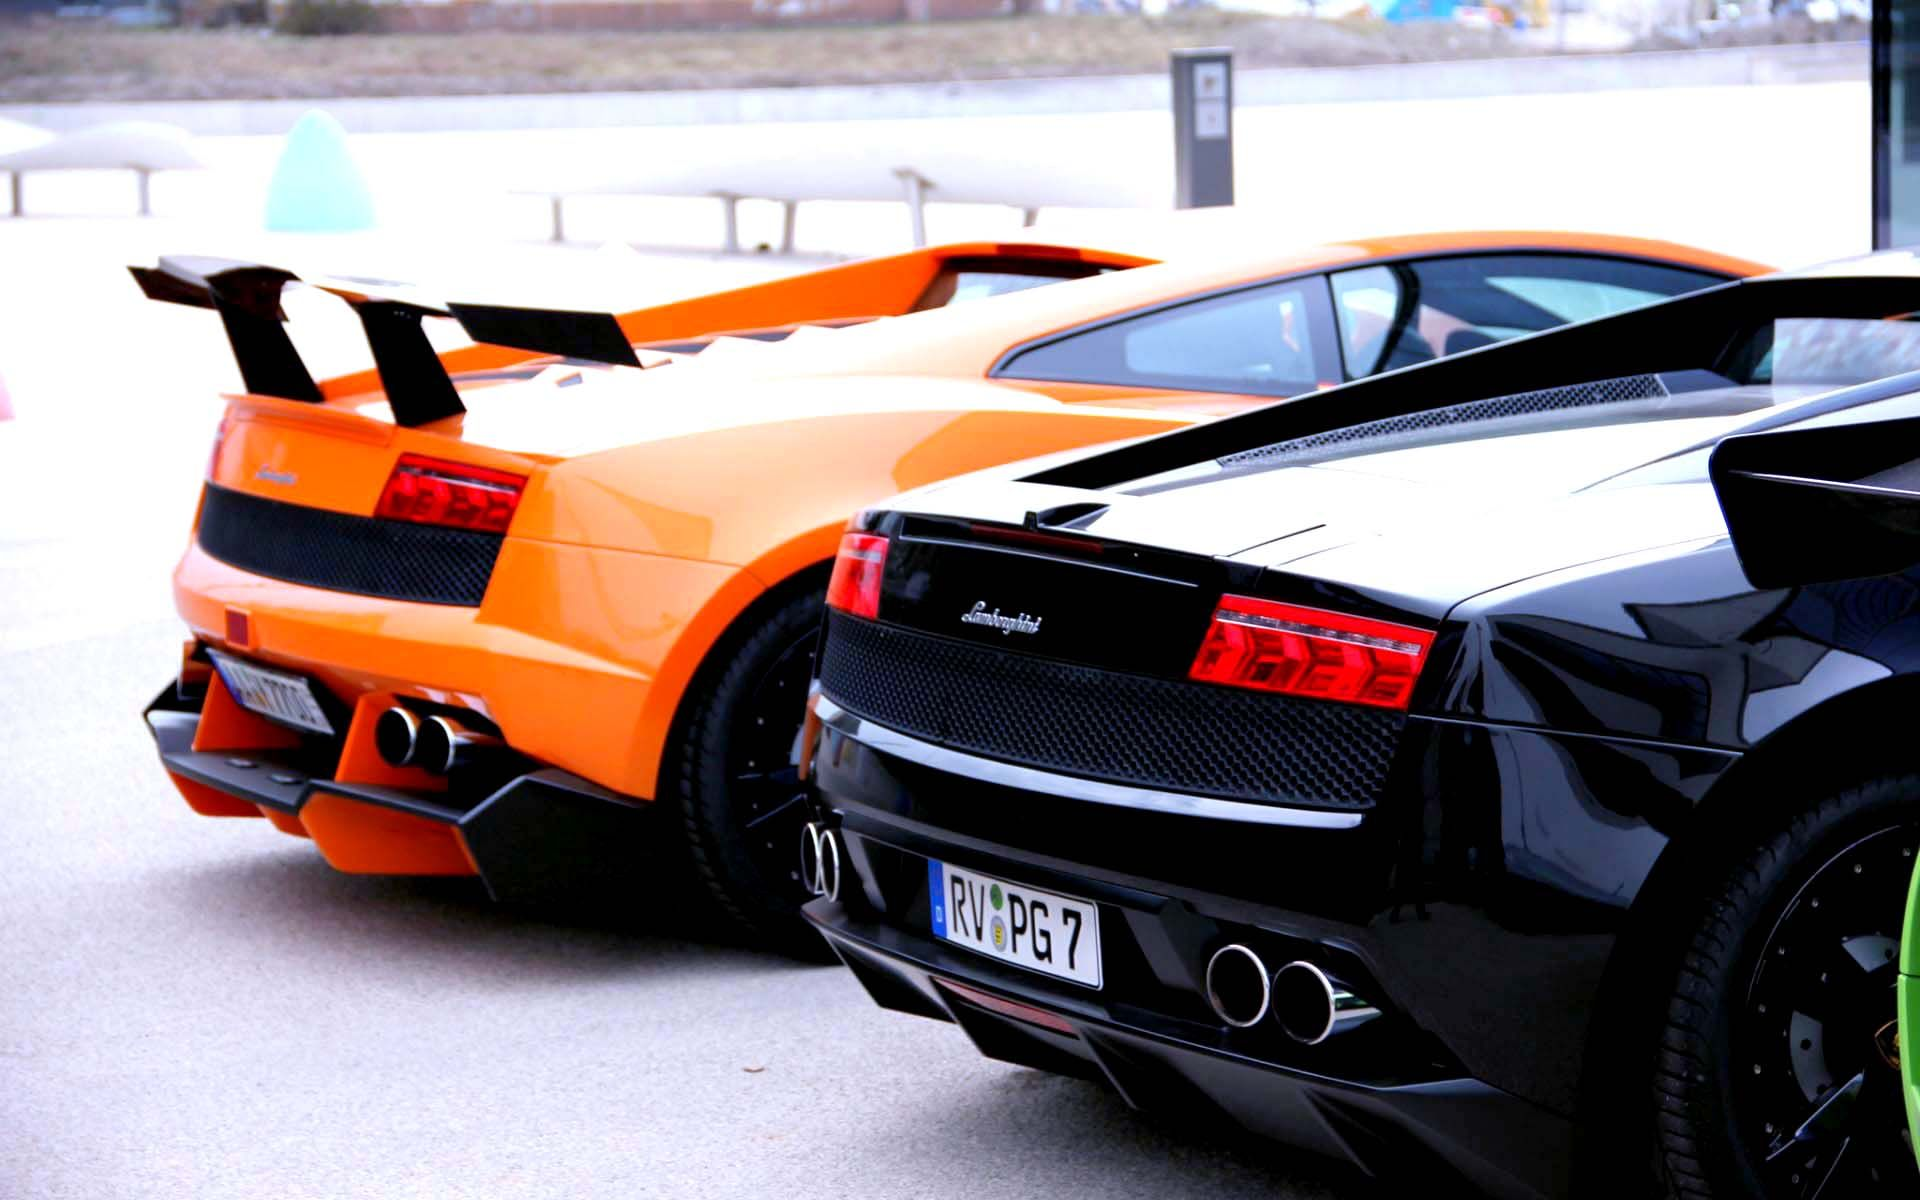 Lamborghini Car On Fast And Furious 7 Movie Wallpaper Free Download Wallpaper From Wallpaperank Com Lamborghini Gallardo Lamborghini Lamborghini Cars